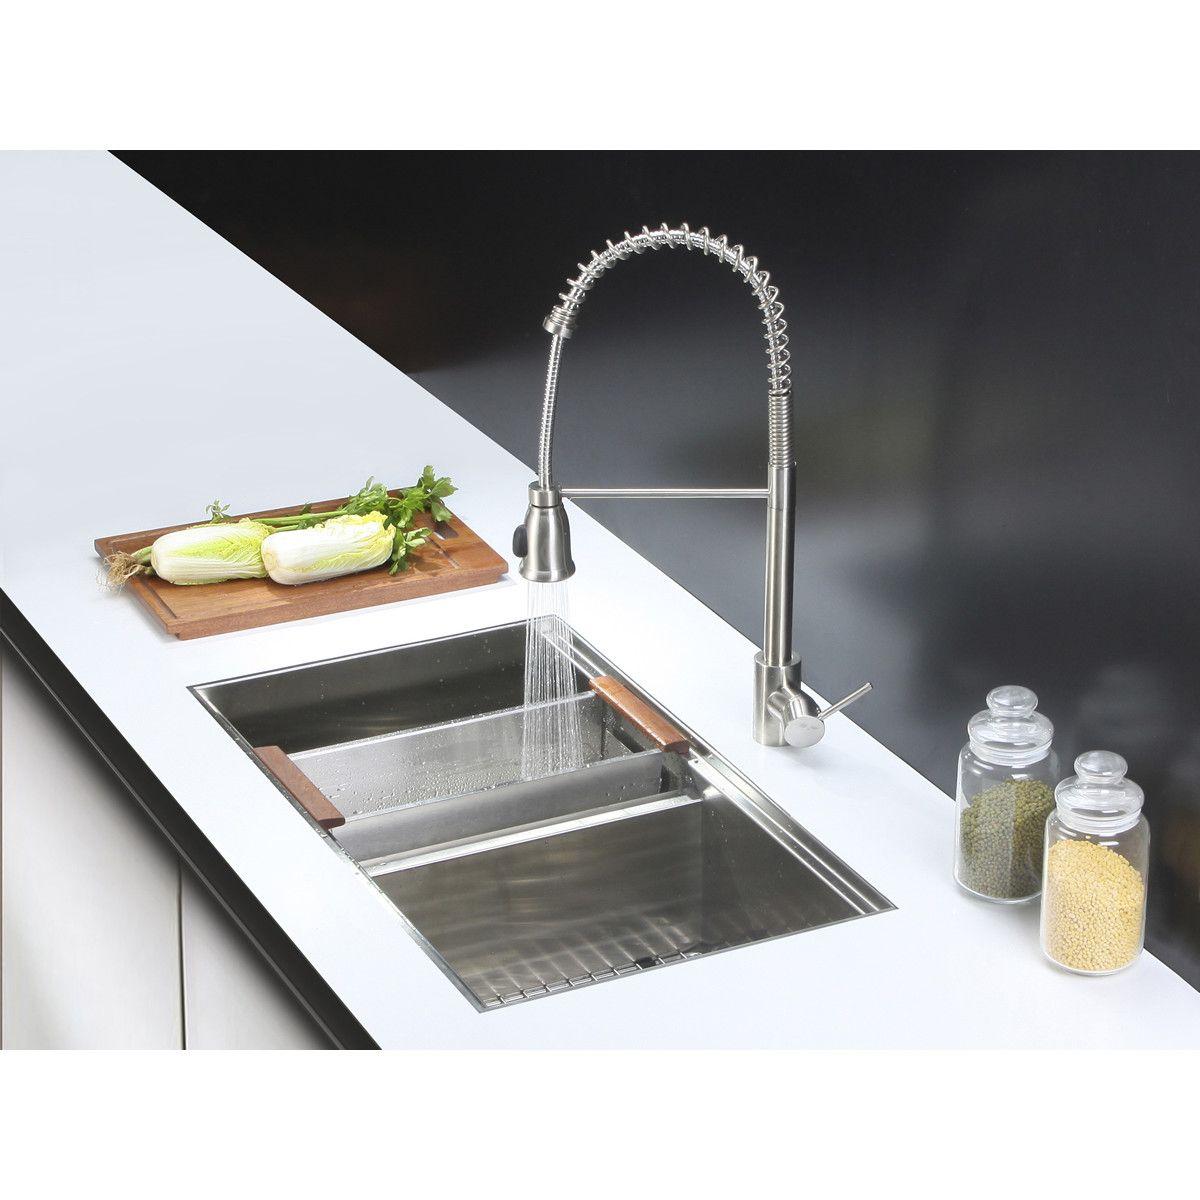 Roma Workstation Ledge 33 L X 19 W Double Basin Undermount Kitchen Sink Kitchen Sink Undermount Kitchen Sinks Double Bowl Kitchen Sink